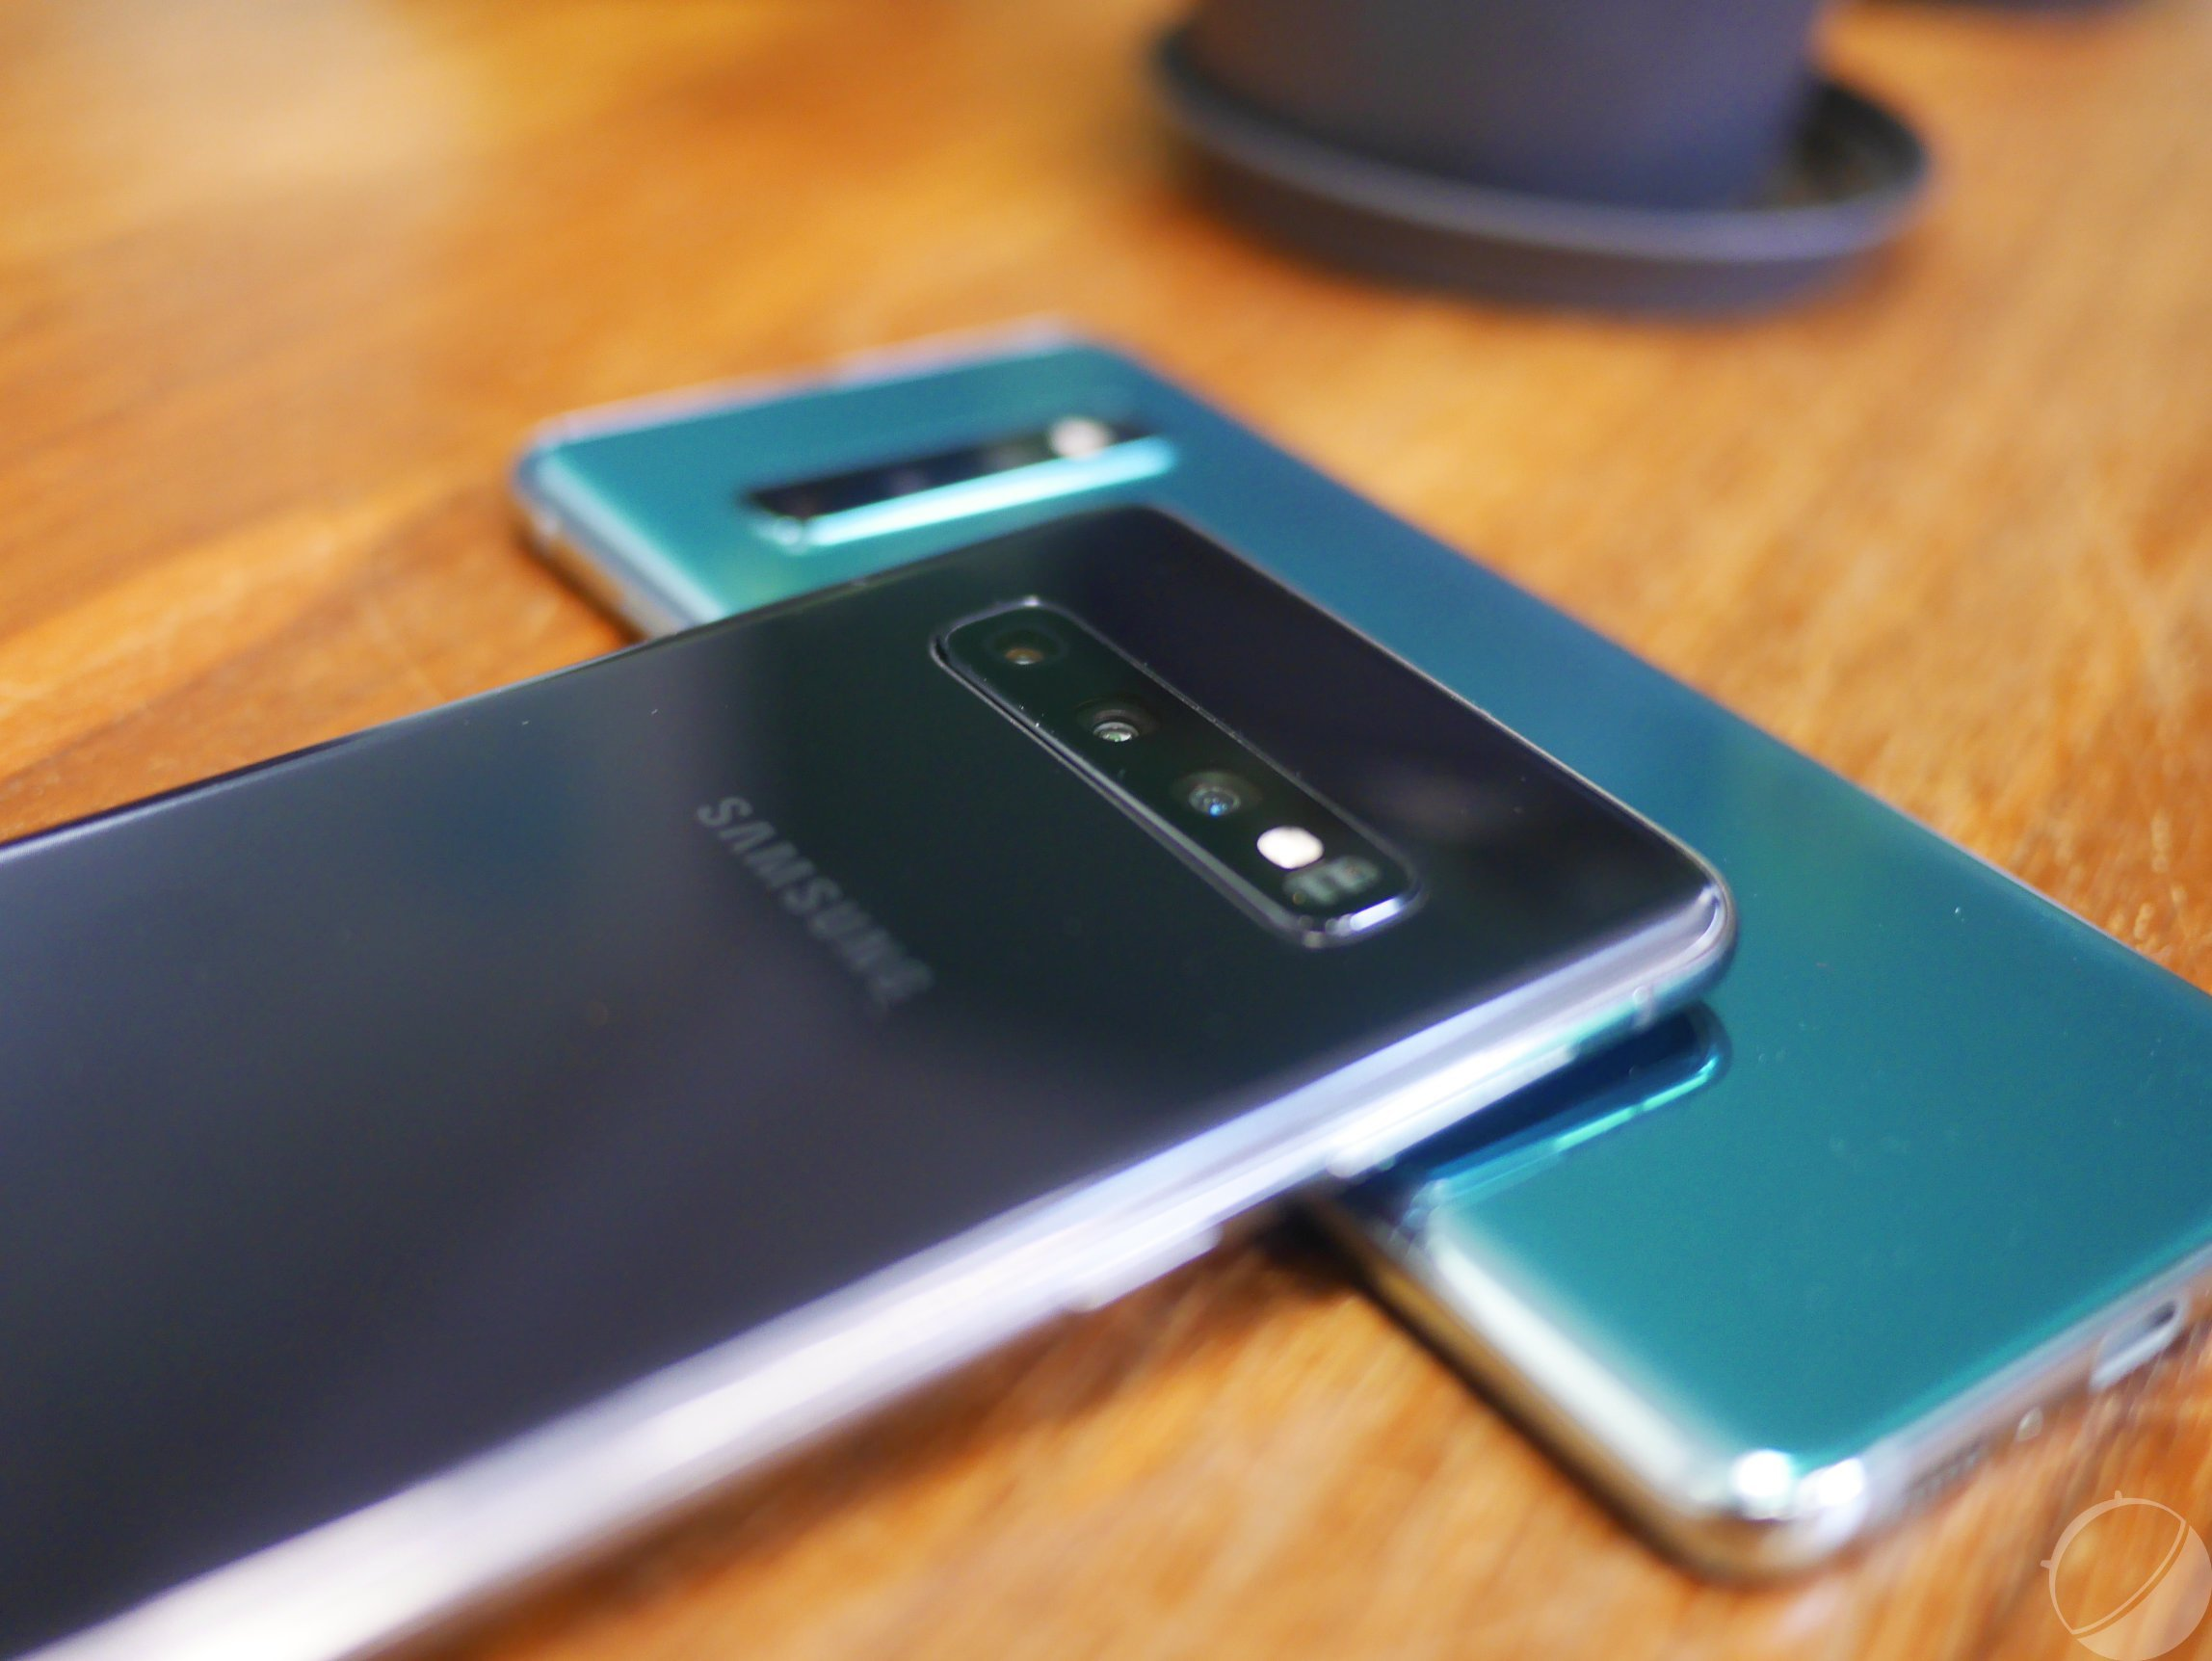 Samsung Galaxy S10 : l'appareil photo reçoit enfin son mode Nuit